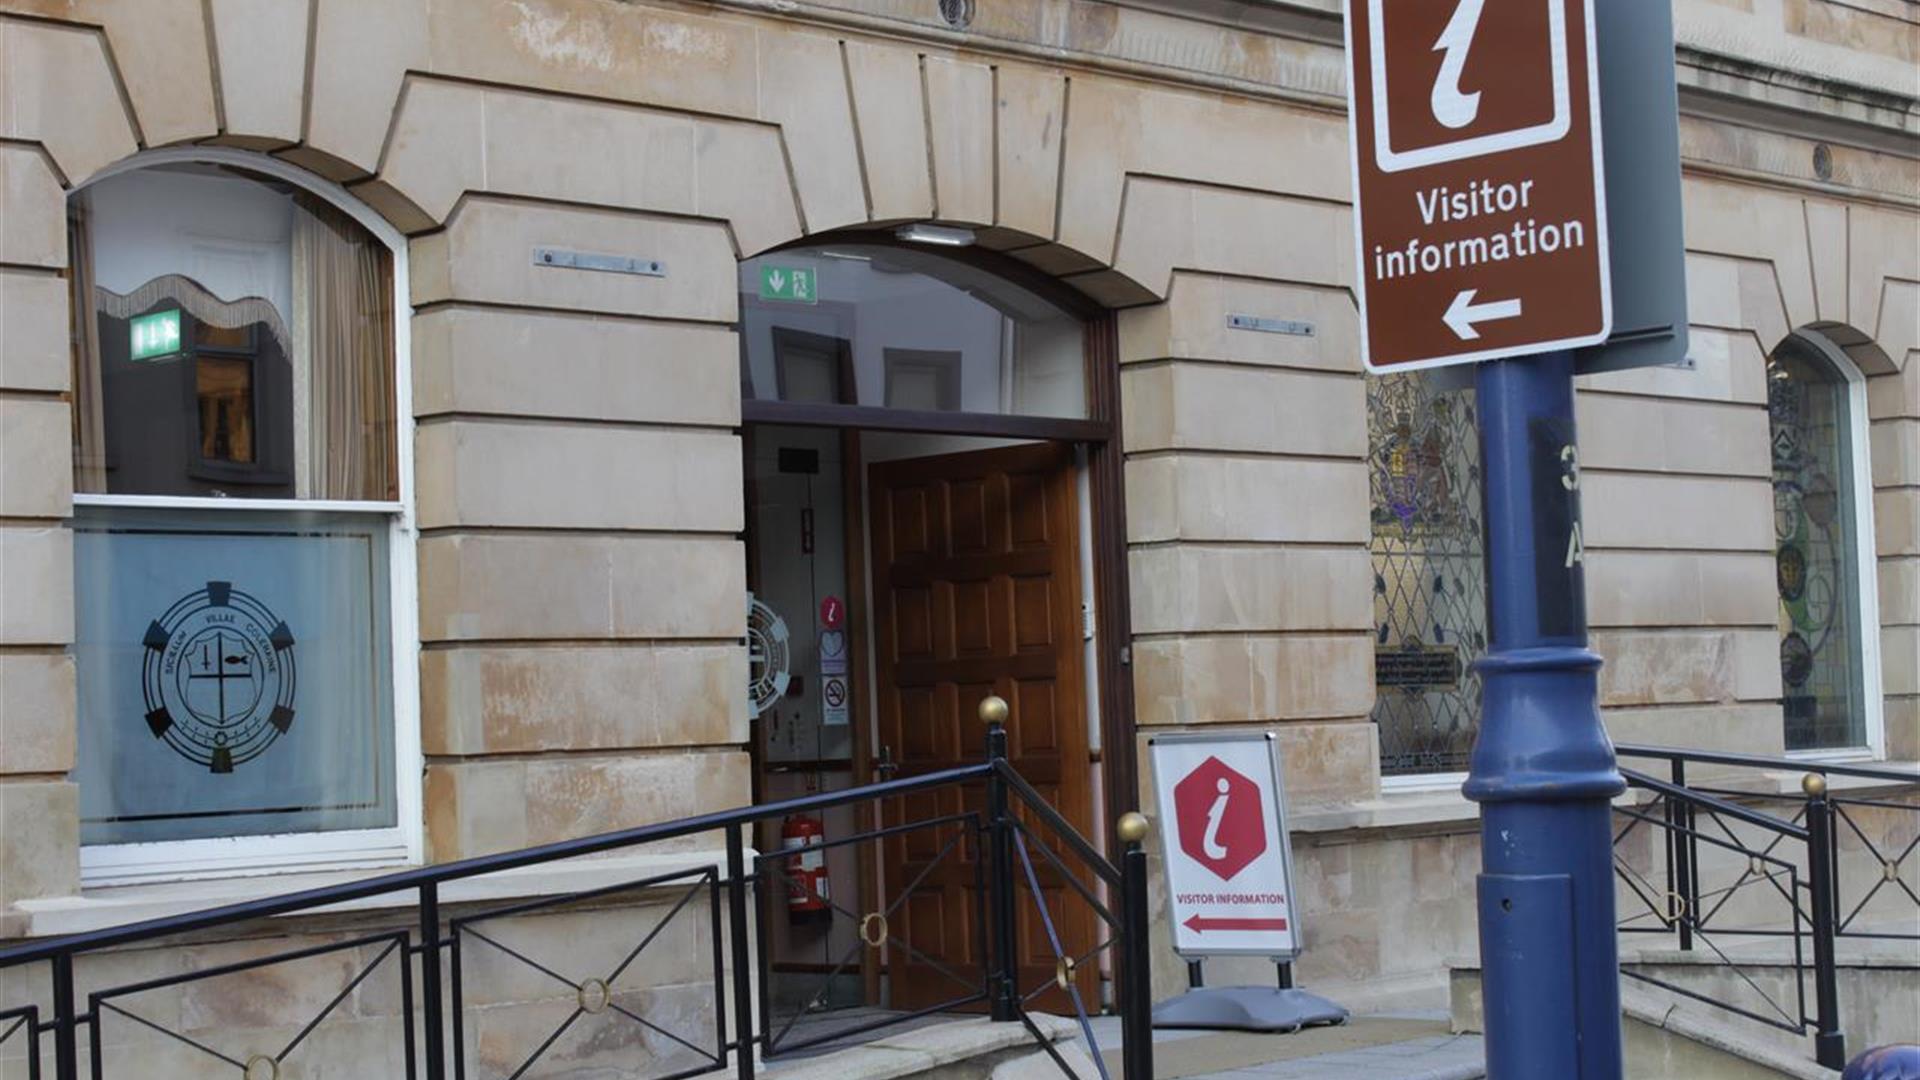 Coleraine Visitor Information Centre